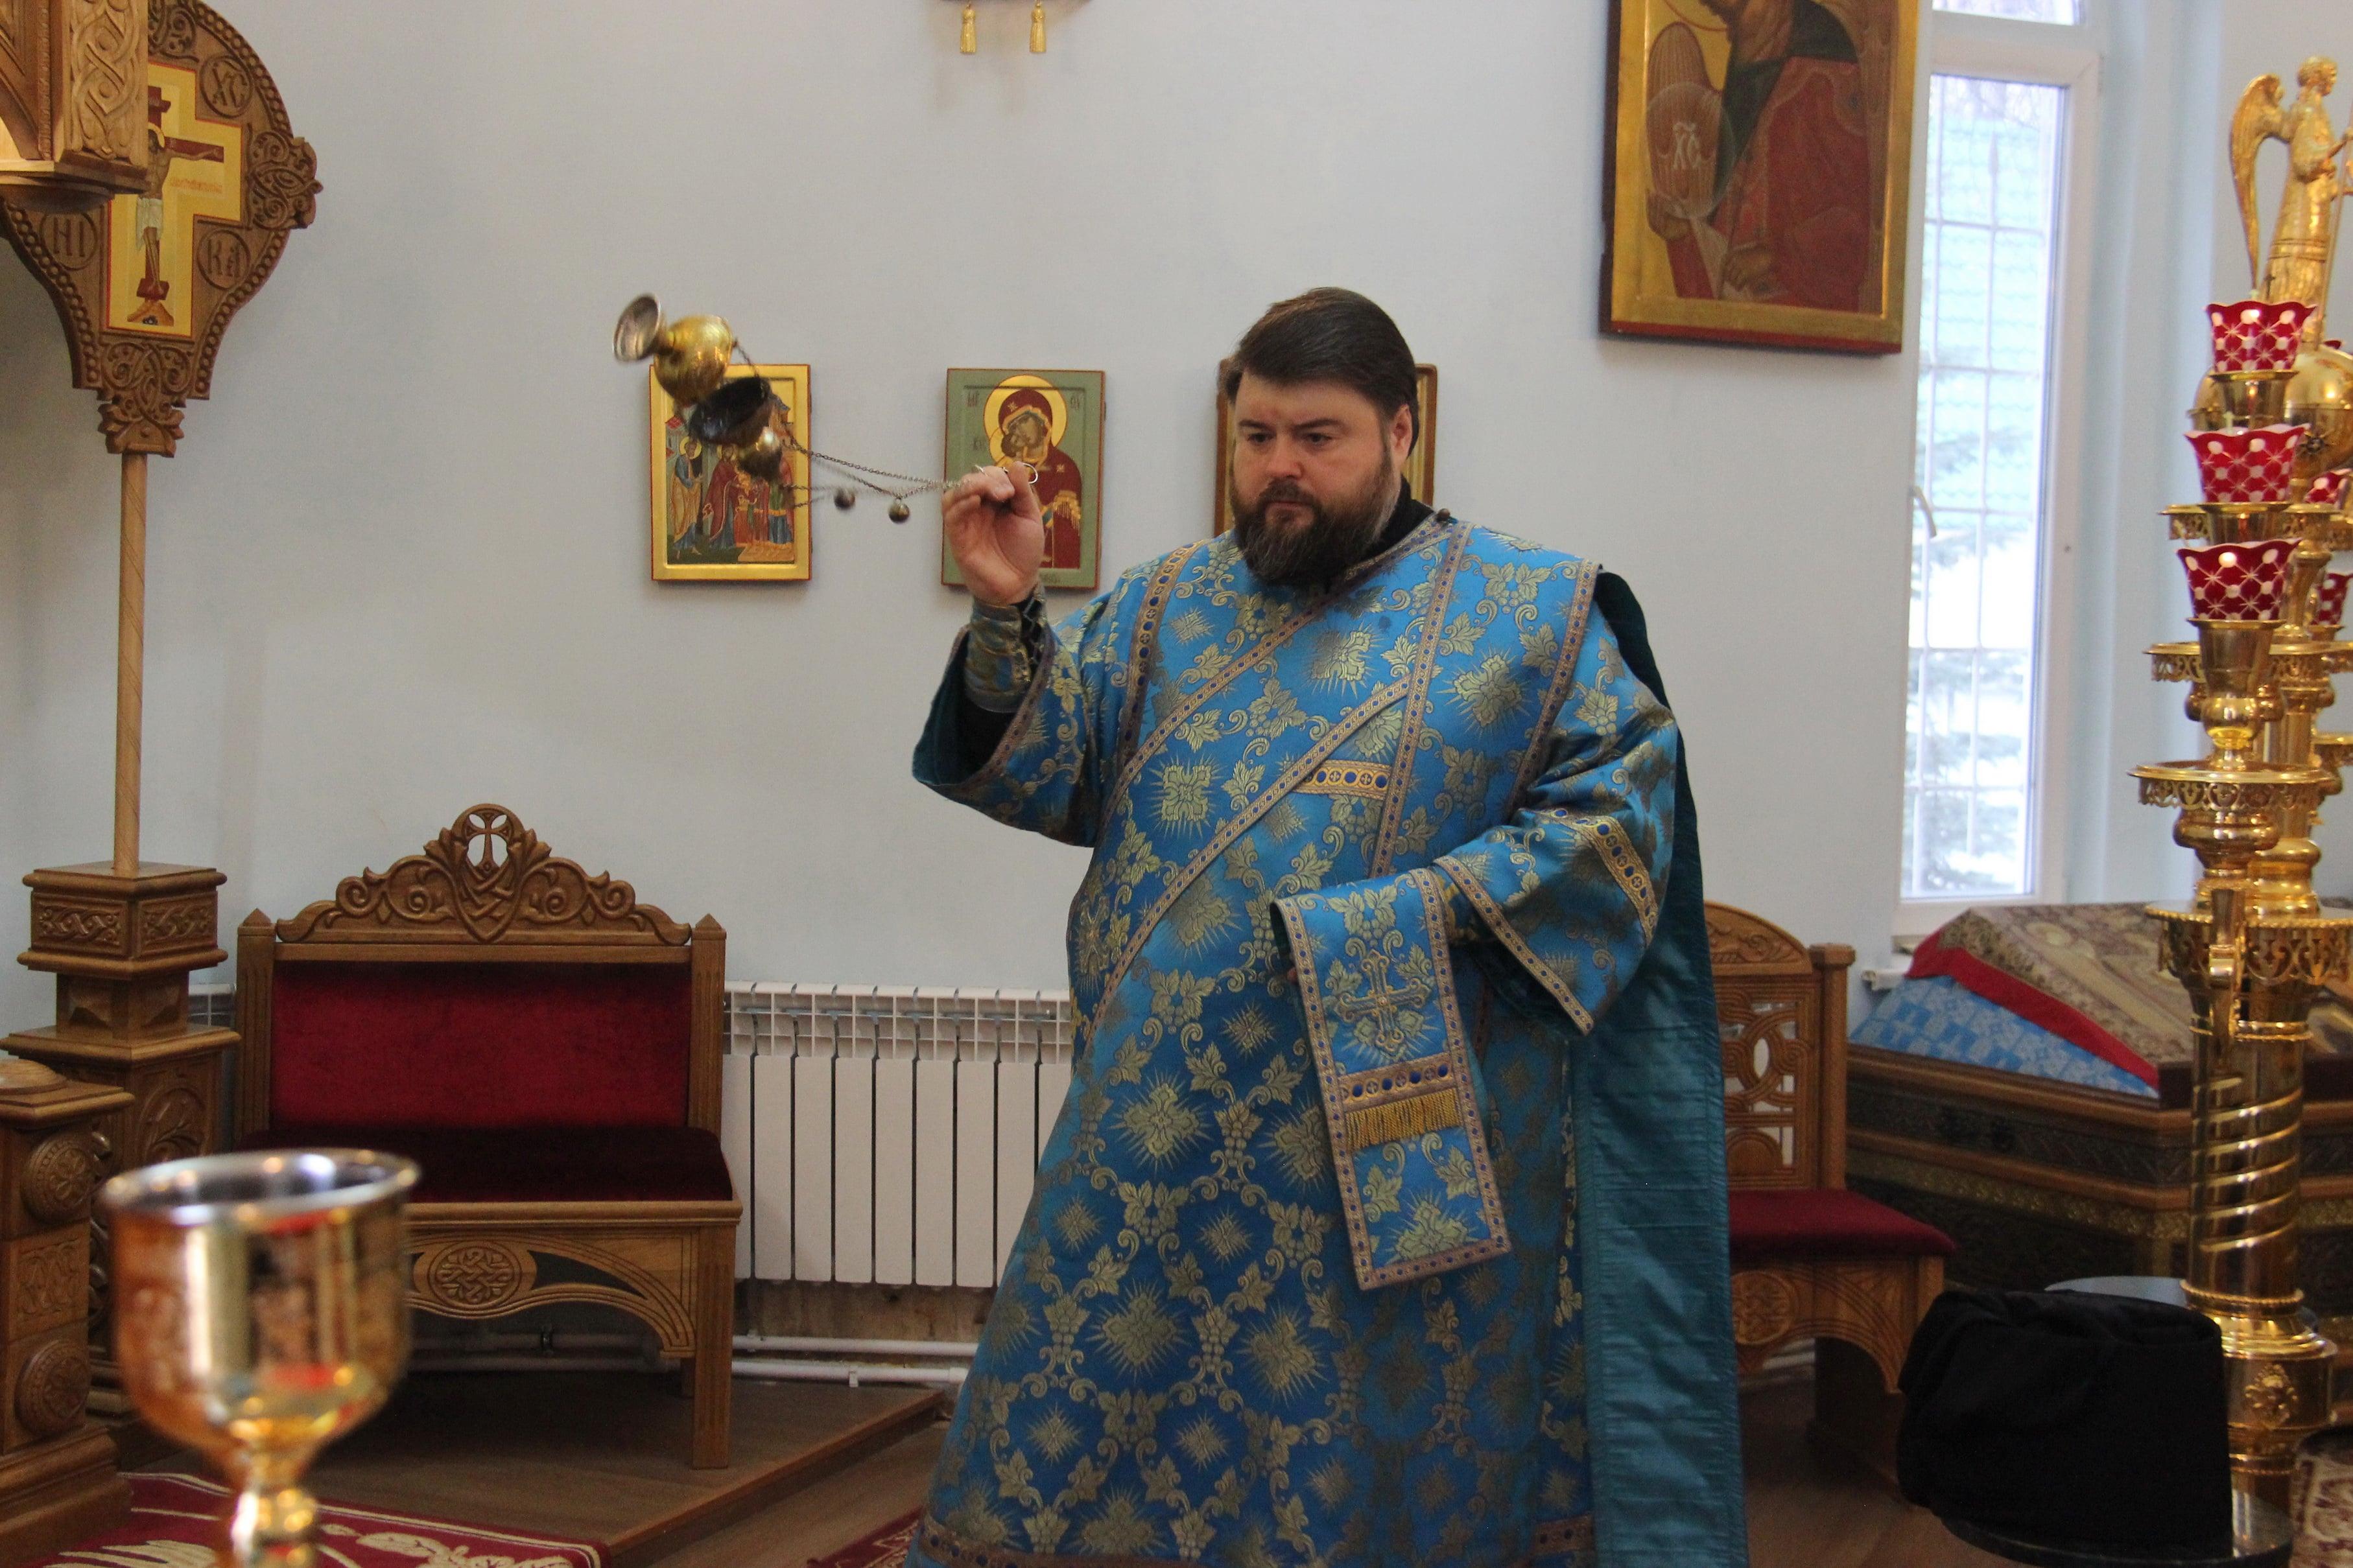 http://monuspen.ru/photoreports/2663d67533f8bbe794375b460e63e953.JPG